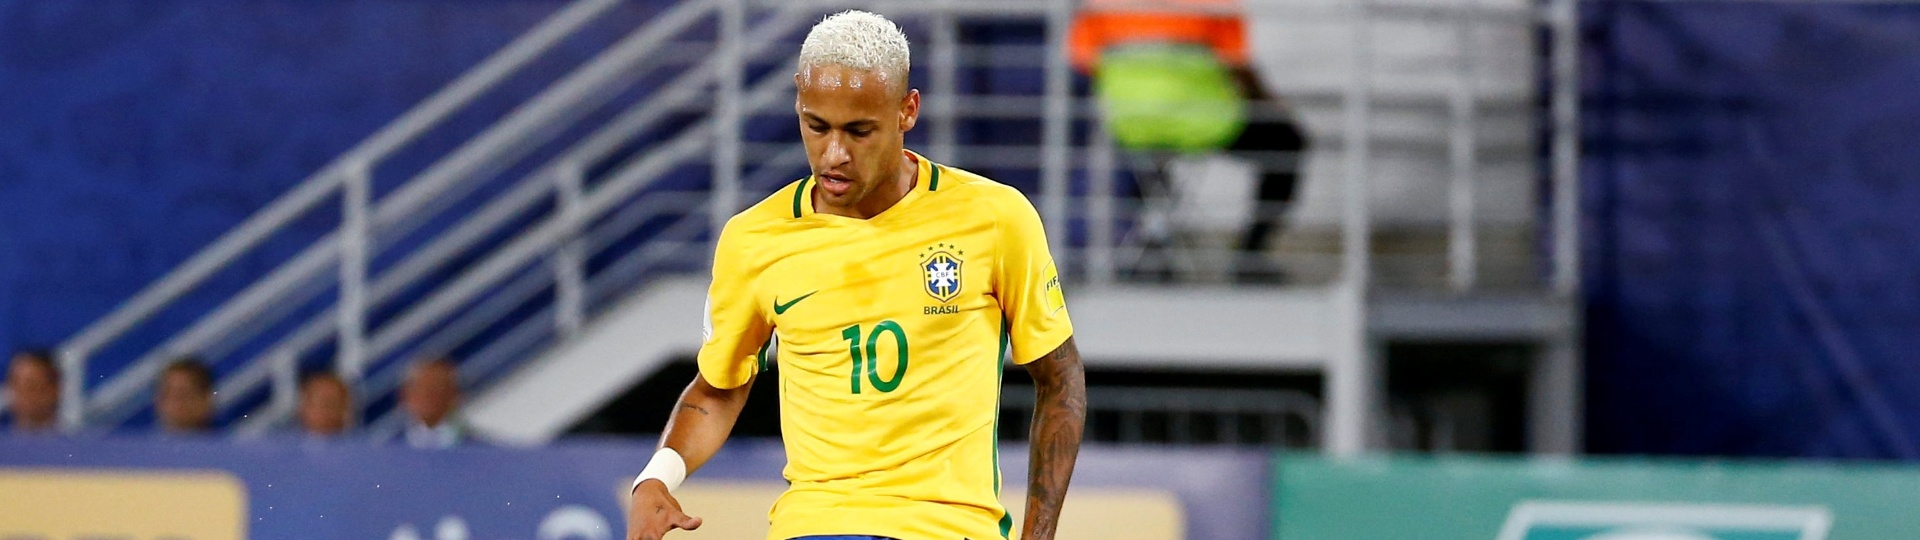 Neymar passa a bola em Brasil x Bolívia